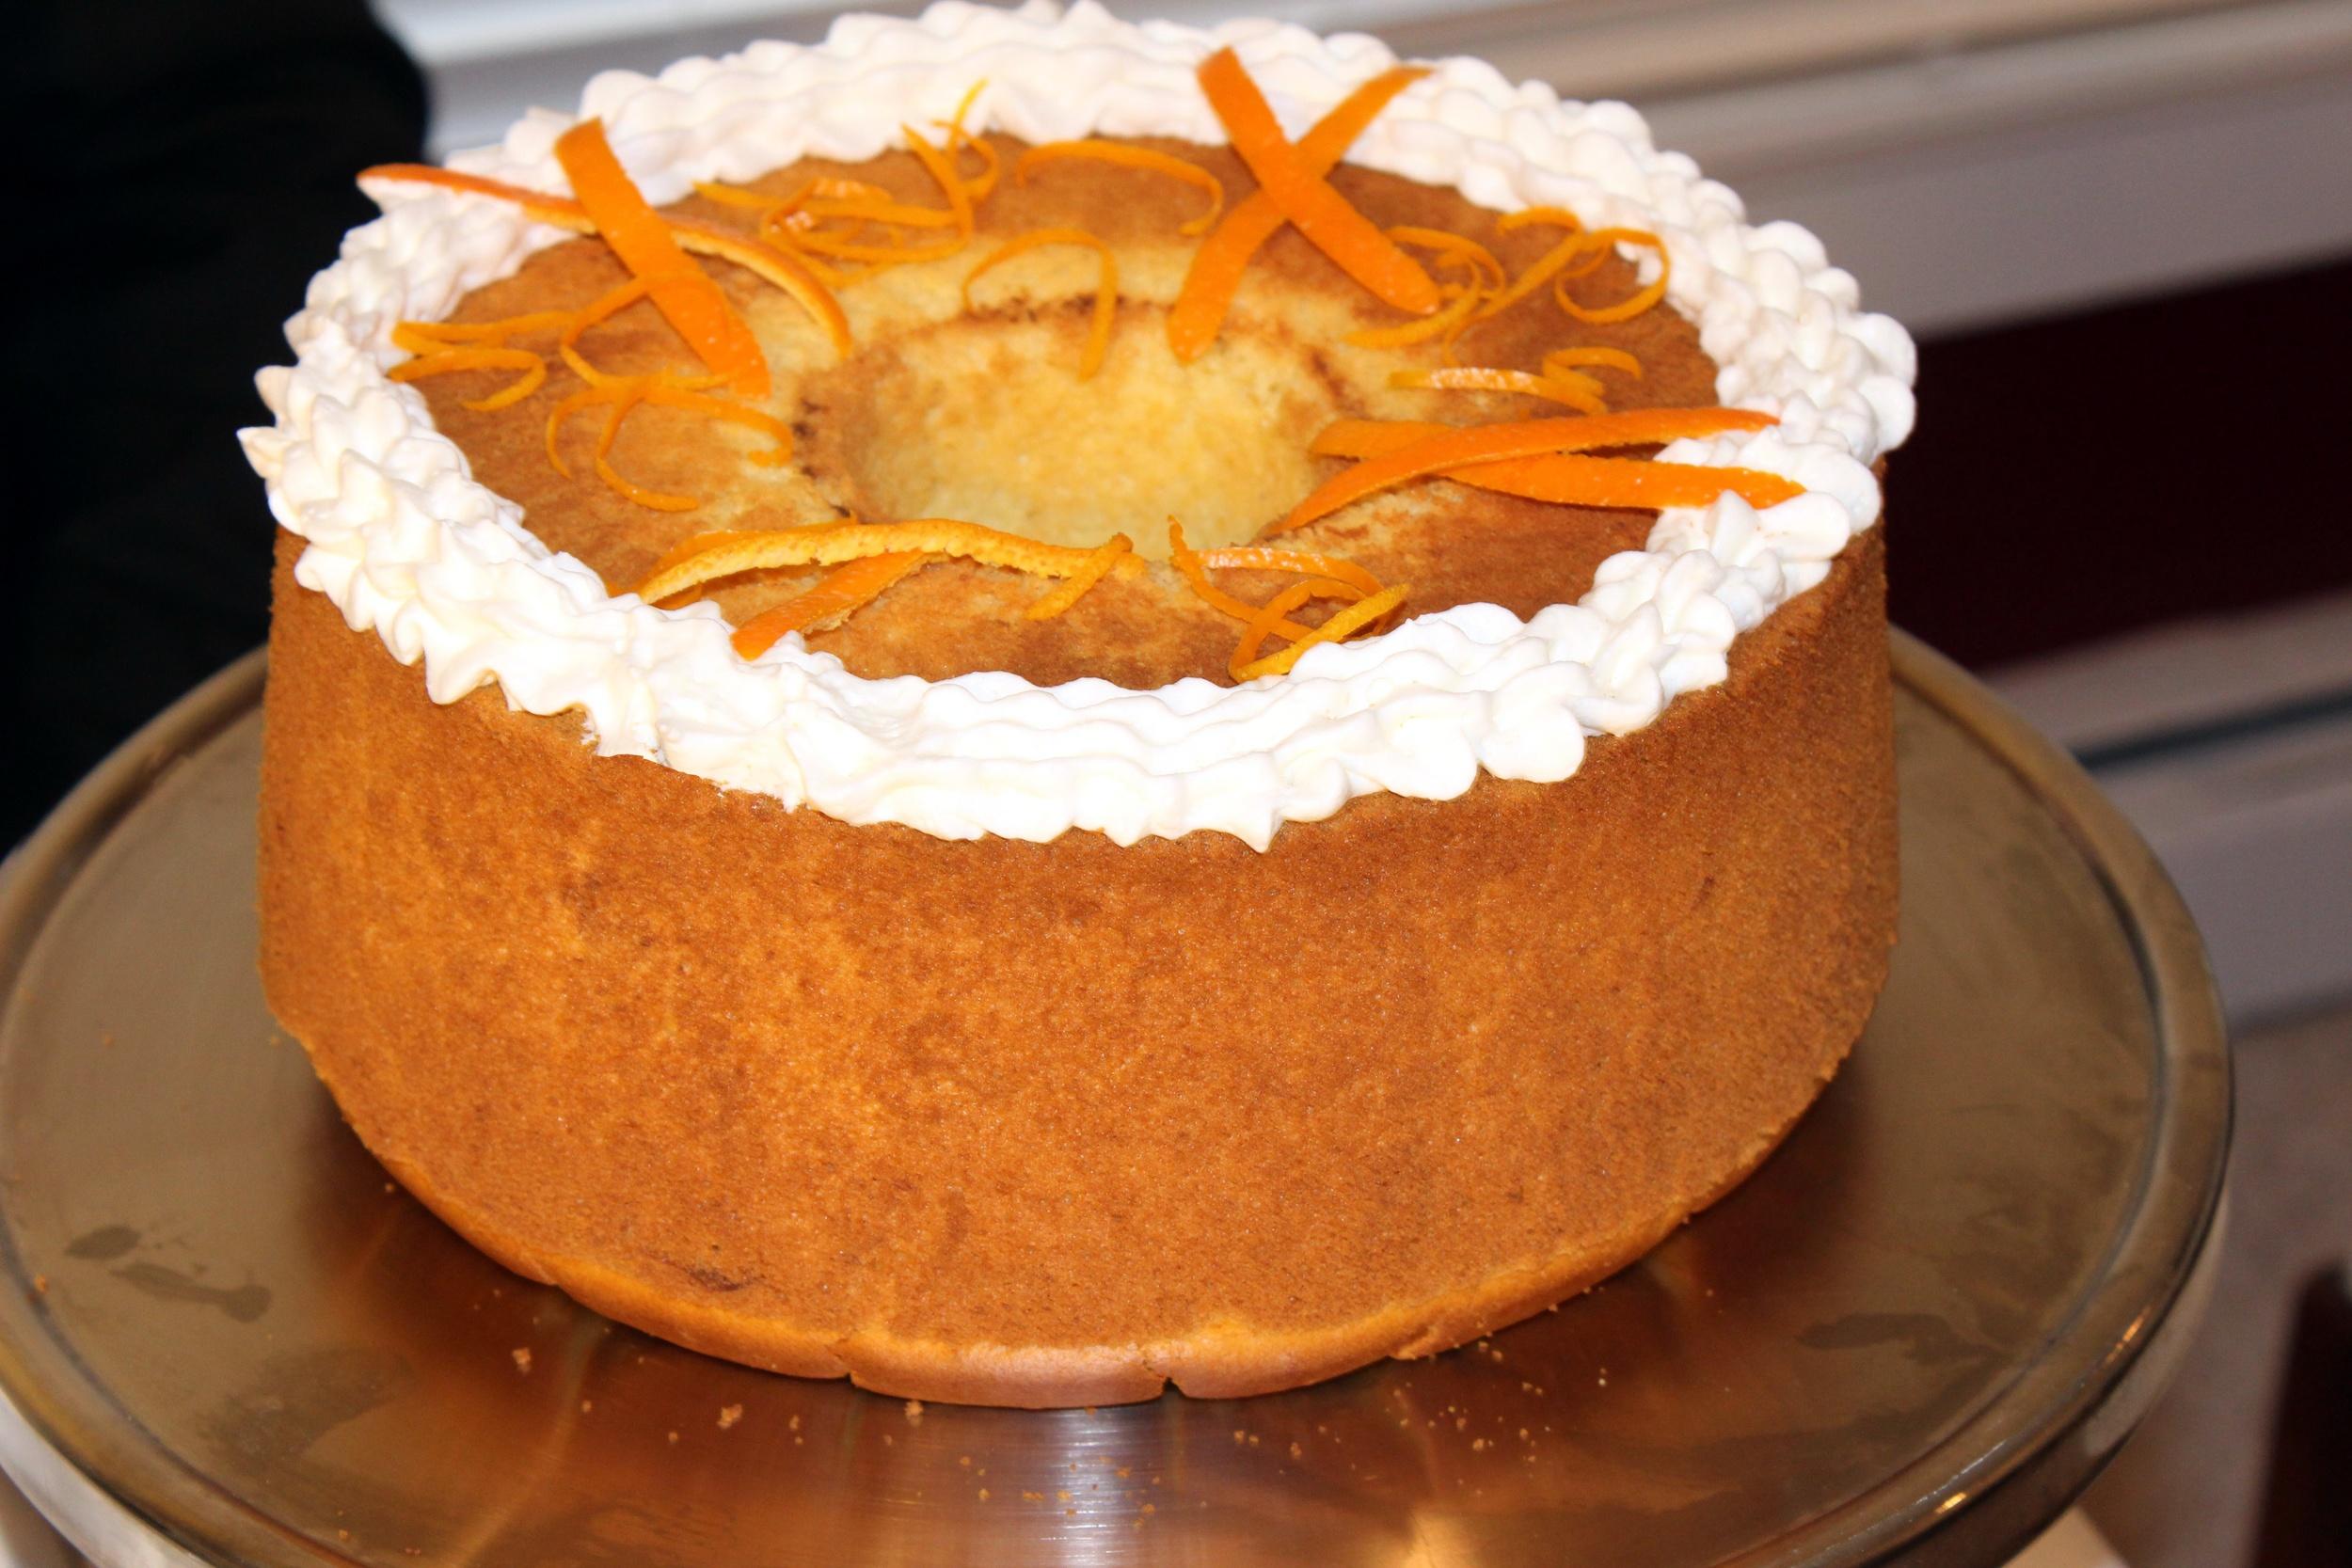 Orange Chiffon Cake on Table ps.jpg